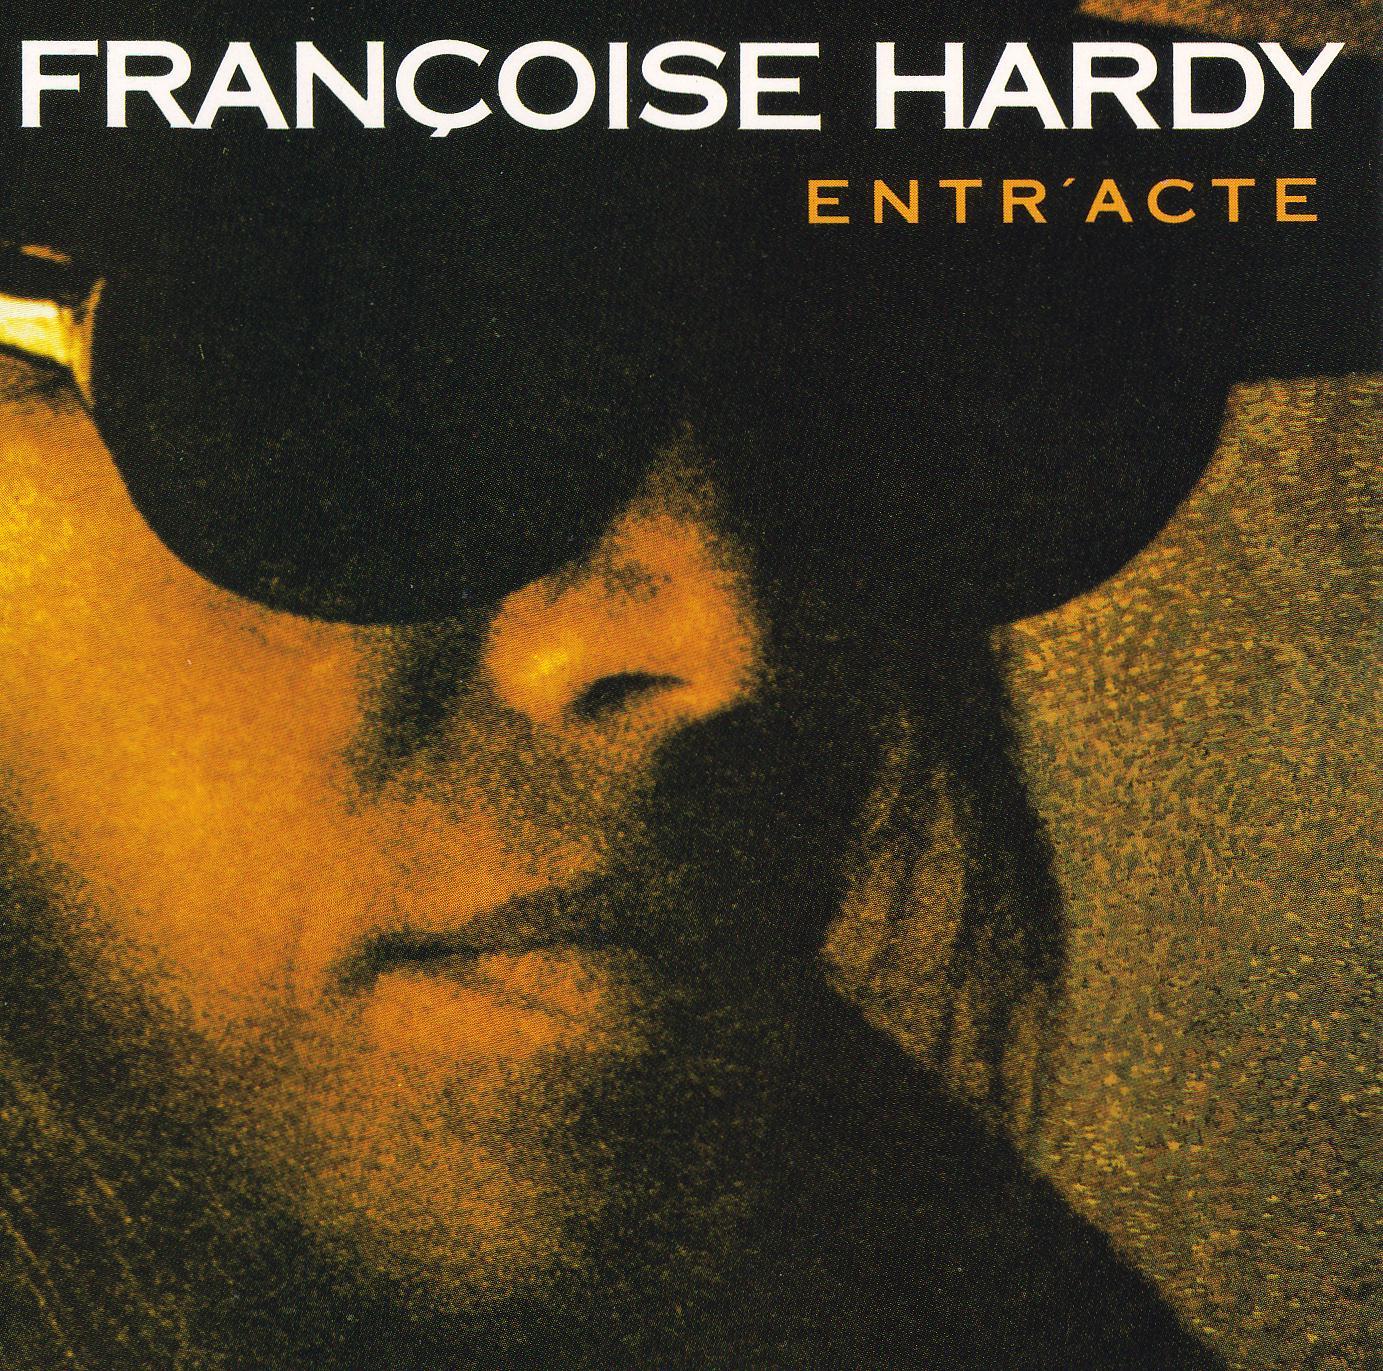 Entr'acte - Francoise Hardy